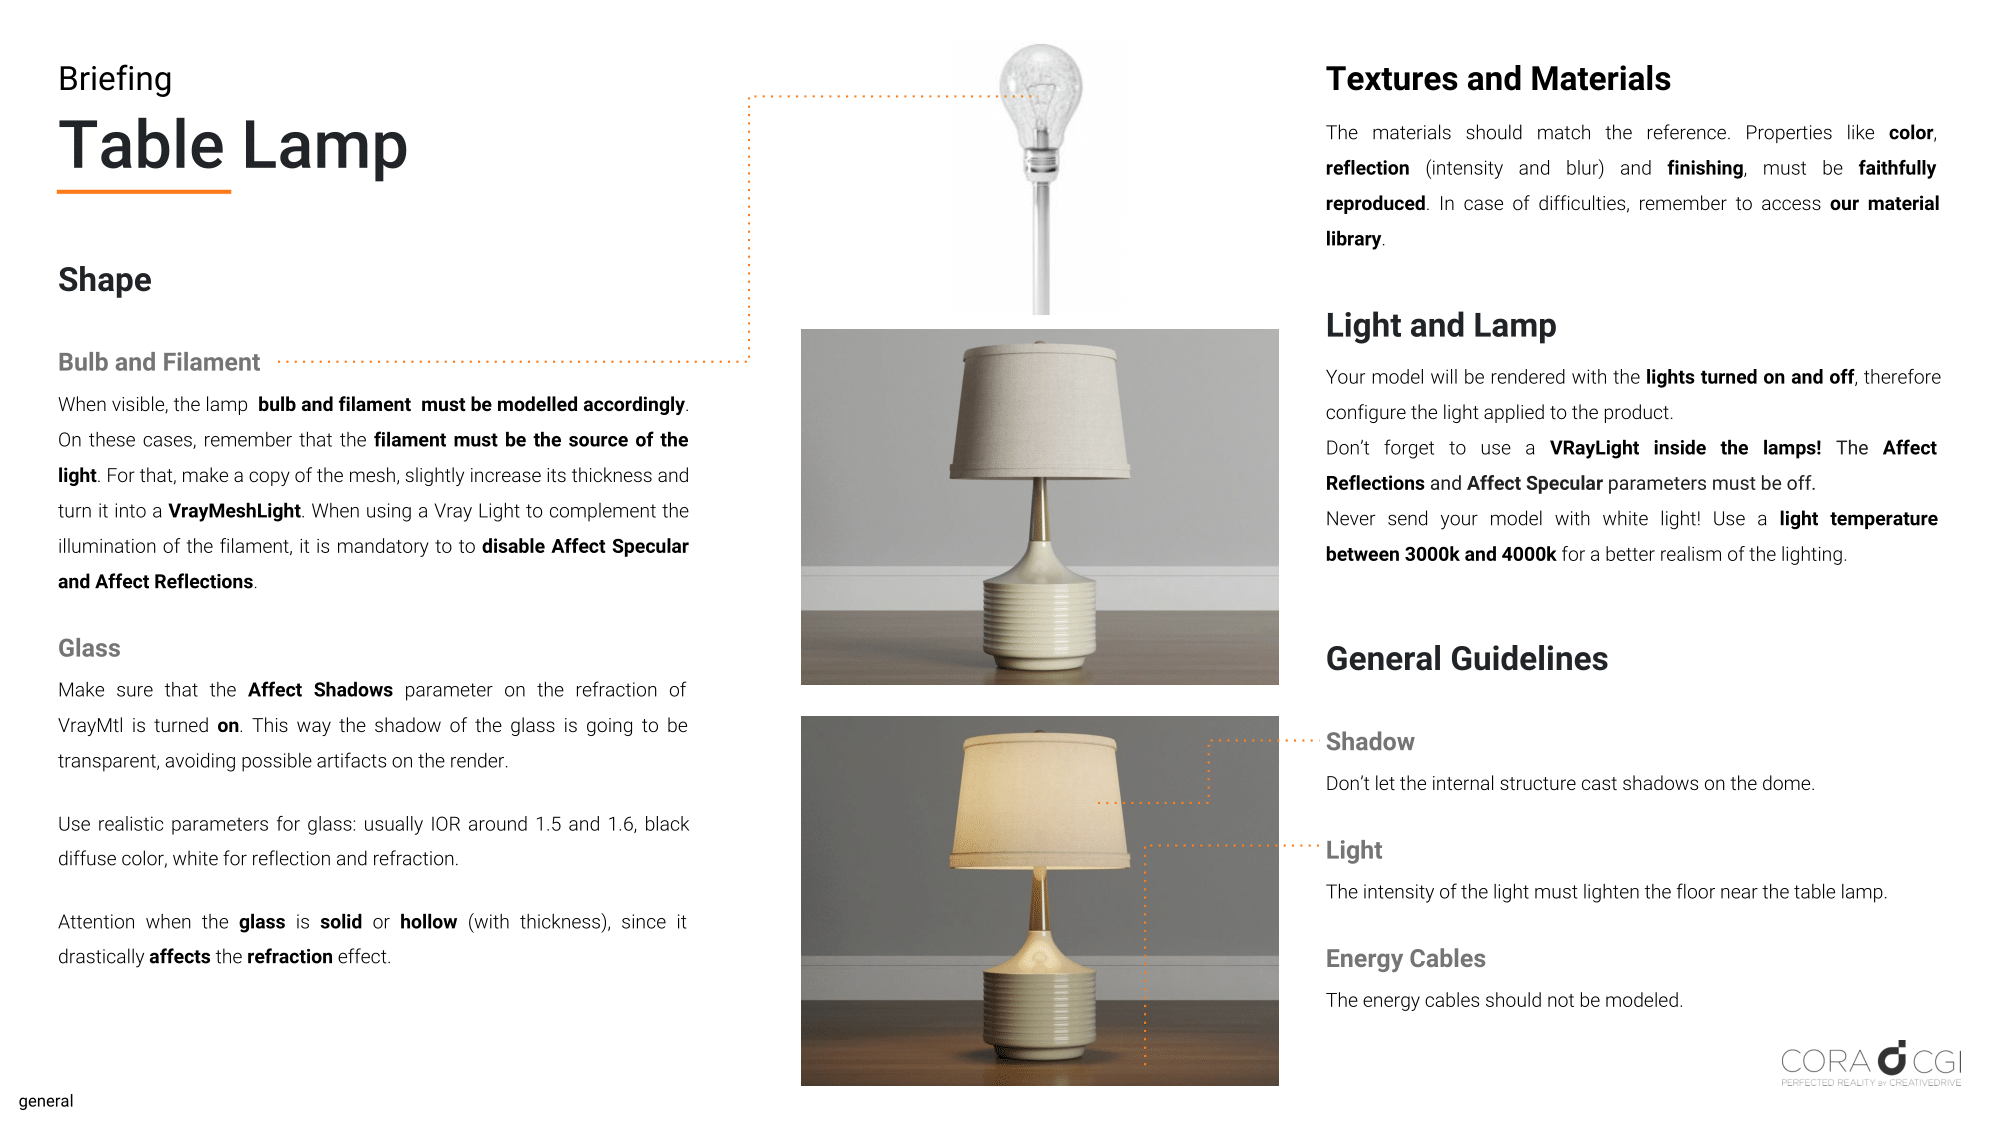 Cora CGI - #251 - Table Lamp - EN